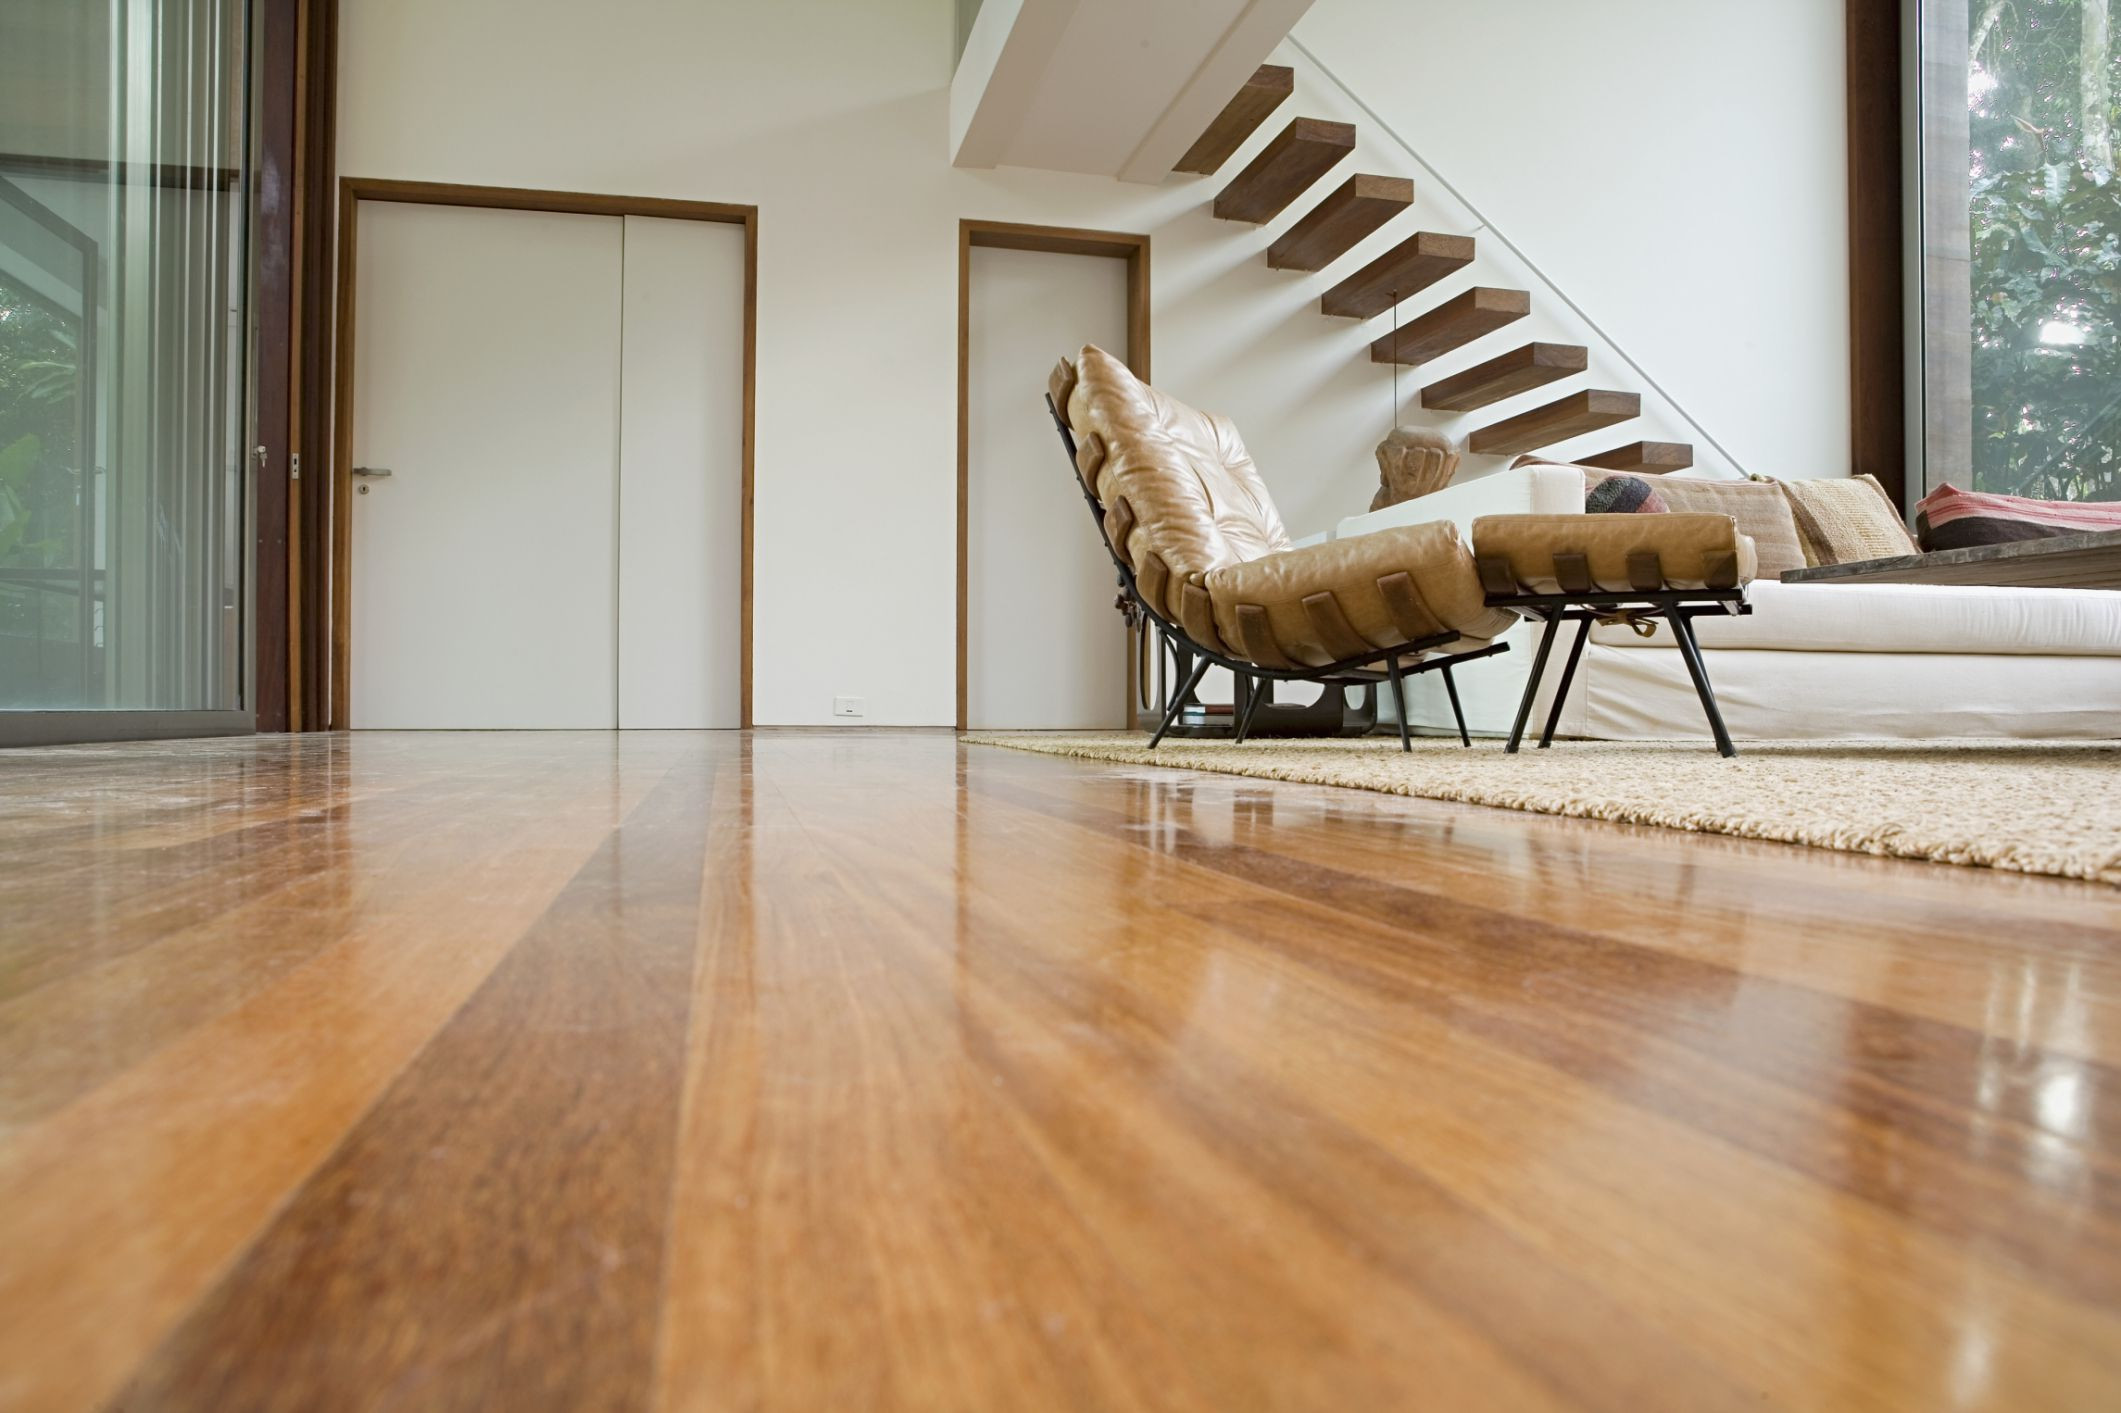 1 2 engineered hardwood flooring of engineered wood flooring vs solid wood flooring pertaining to 200571260 001 highres 56a49dec5f9b58b7d0d7dc1e